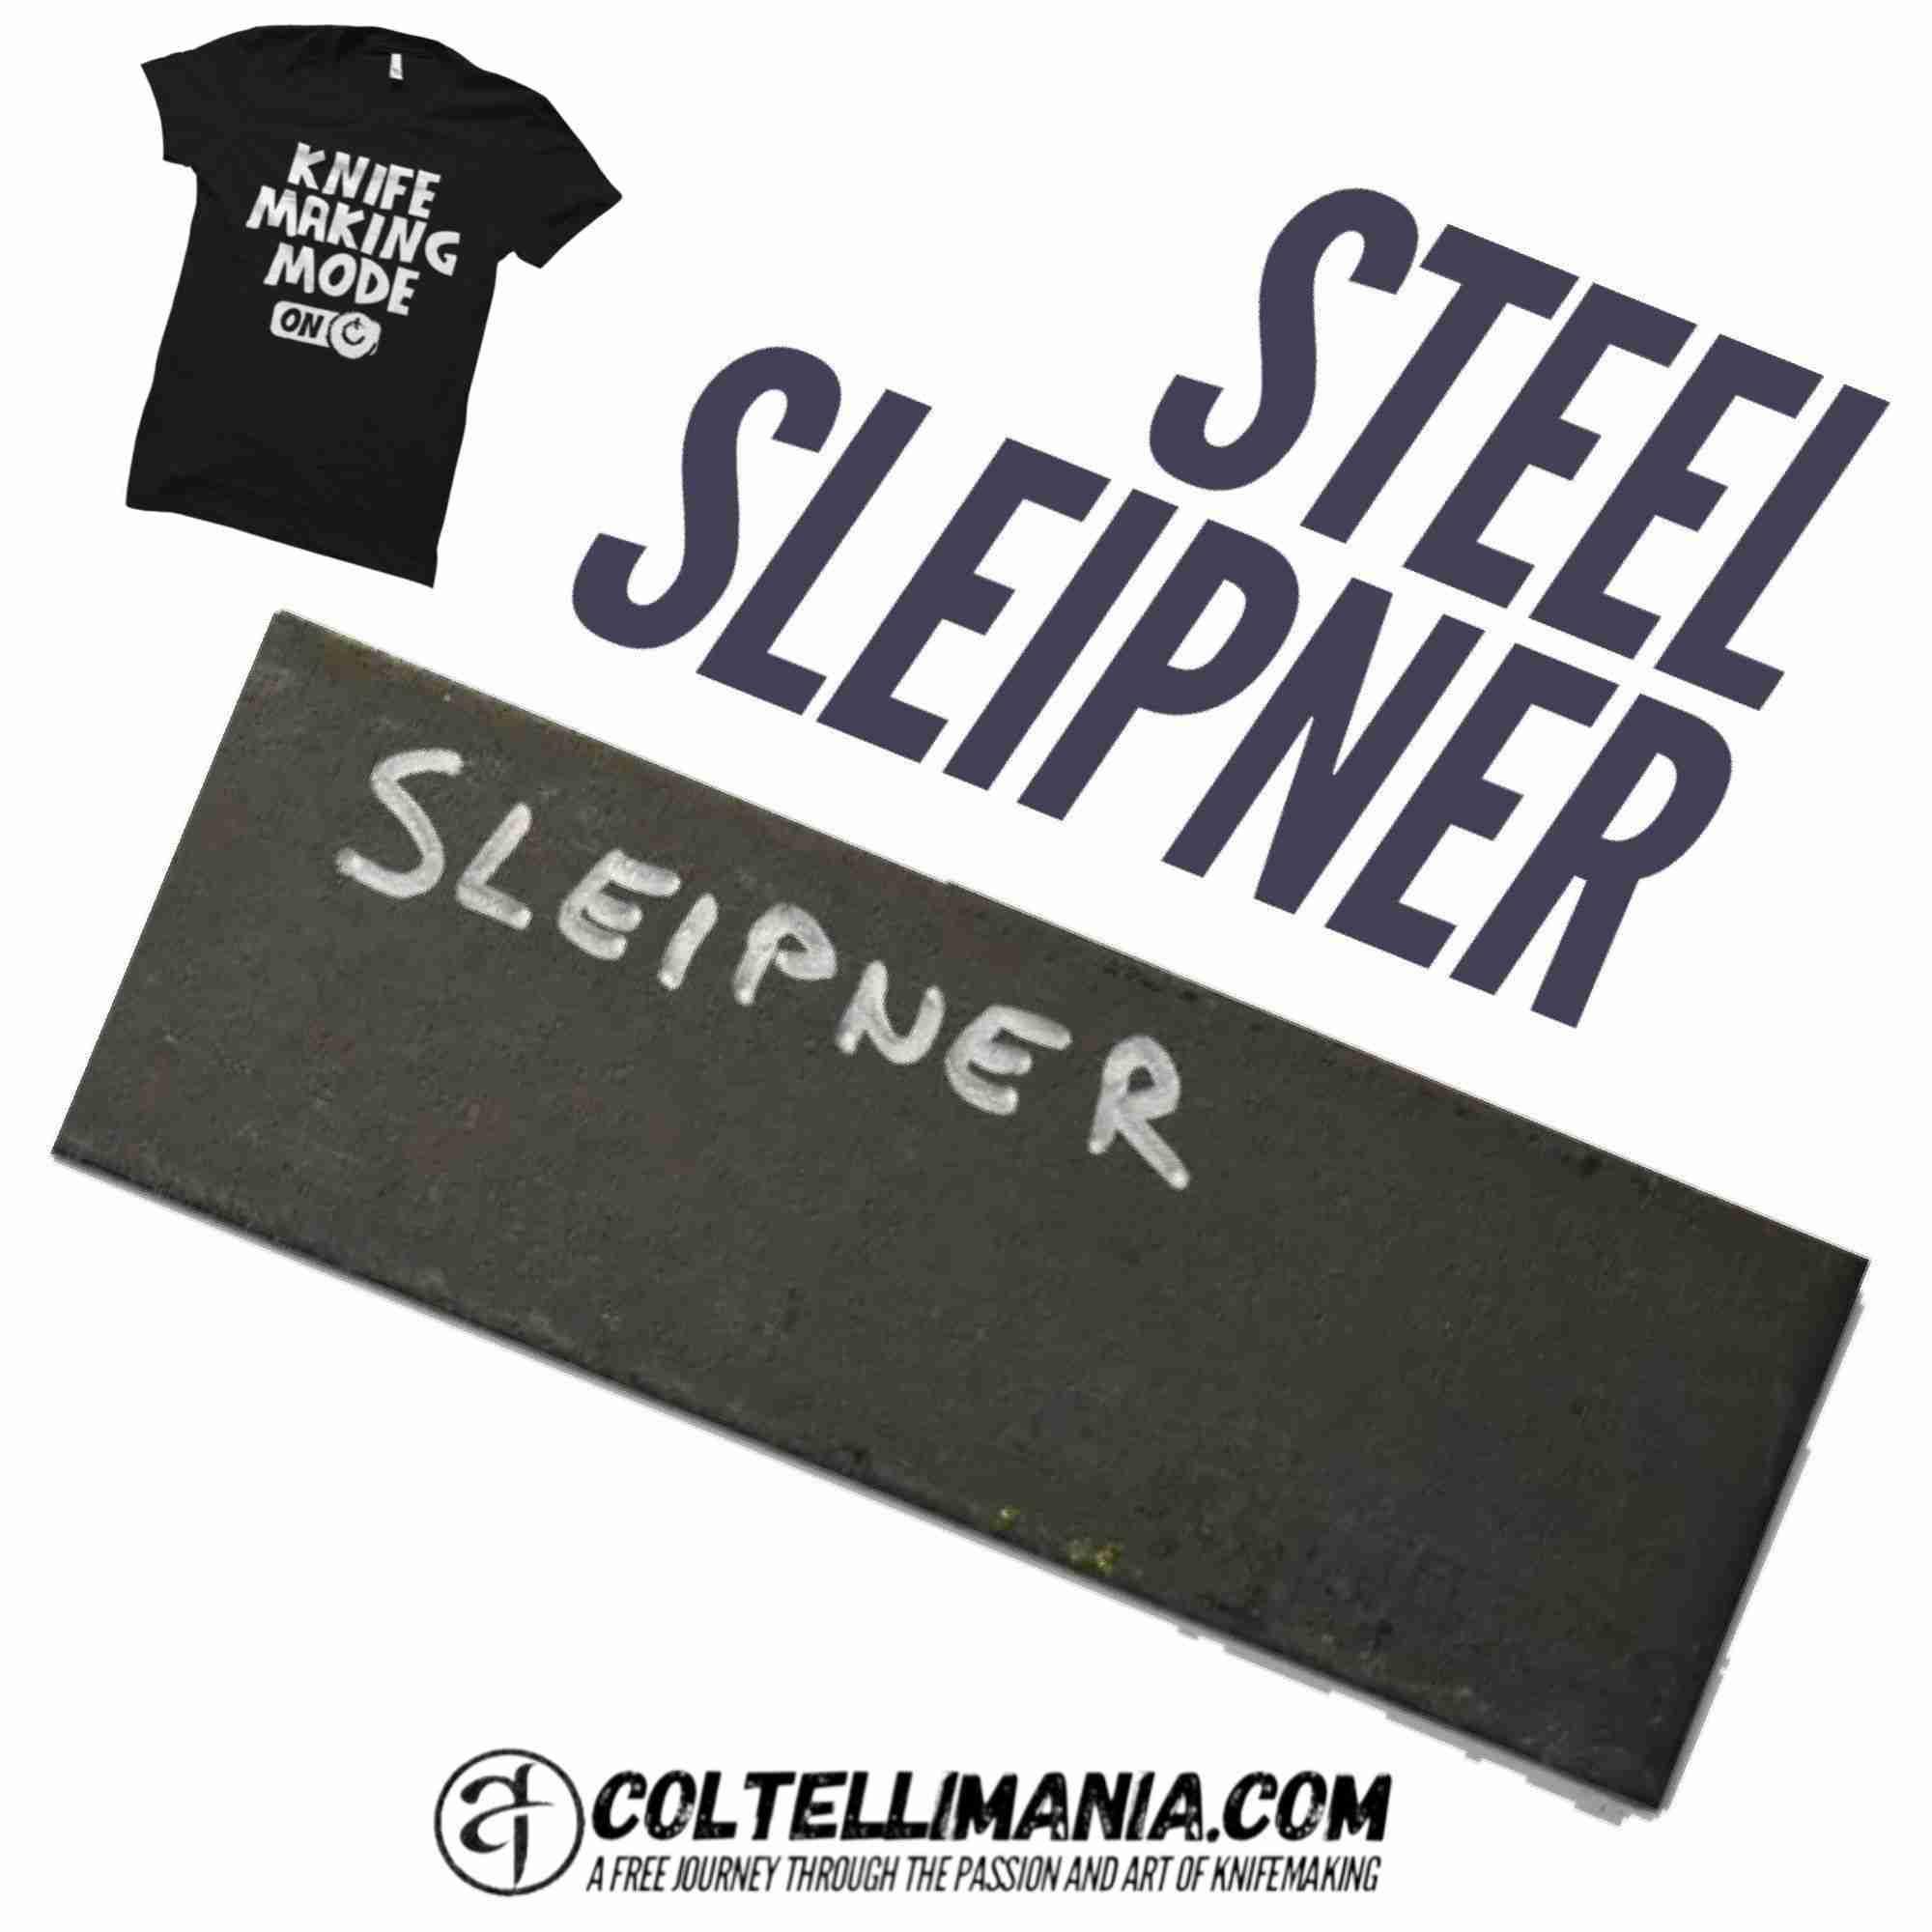 Acciaio Sleipner